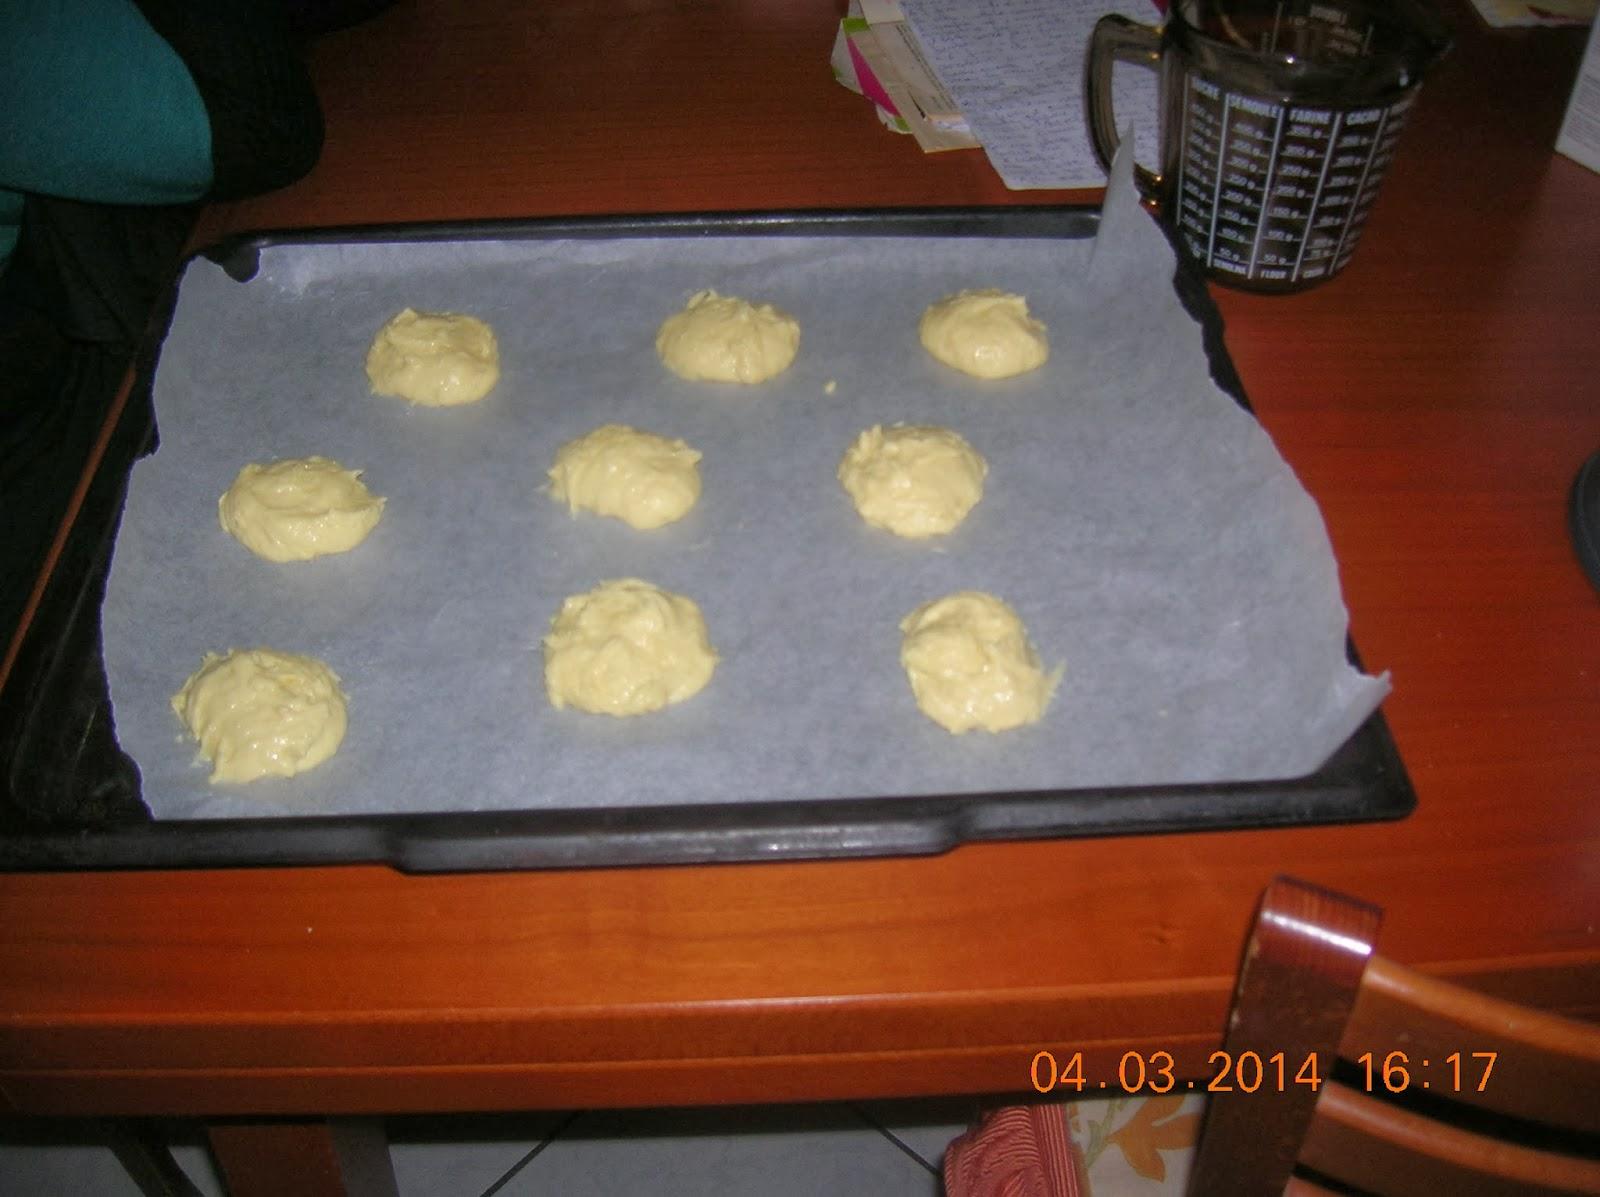 le zeppole di  san giuseppe  senza uova alla marylen..con crema pasticcera vegan